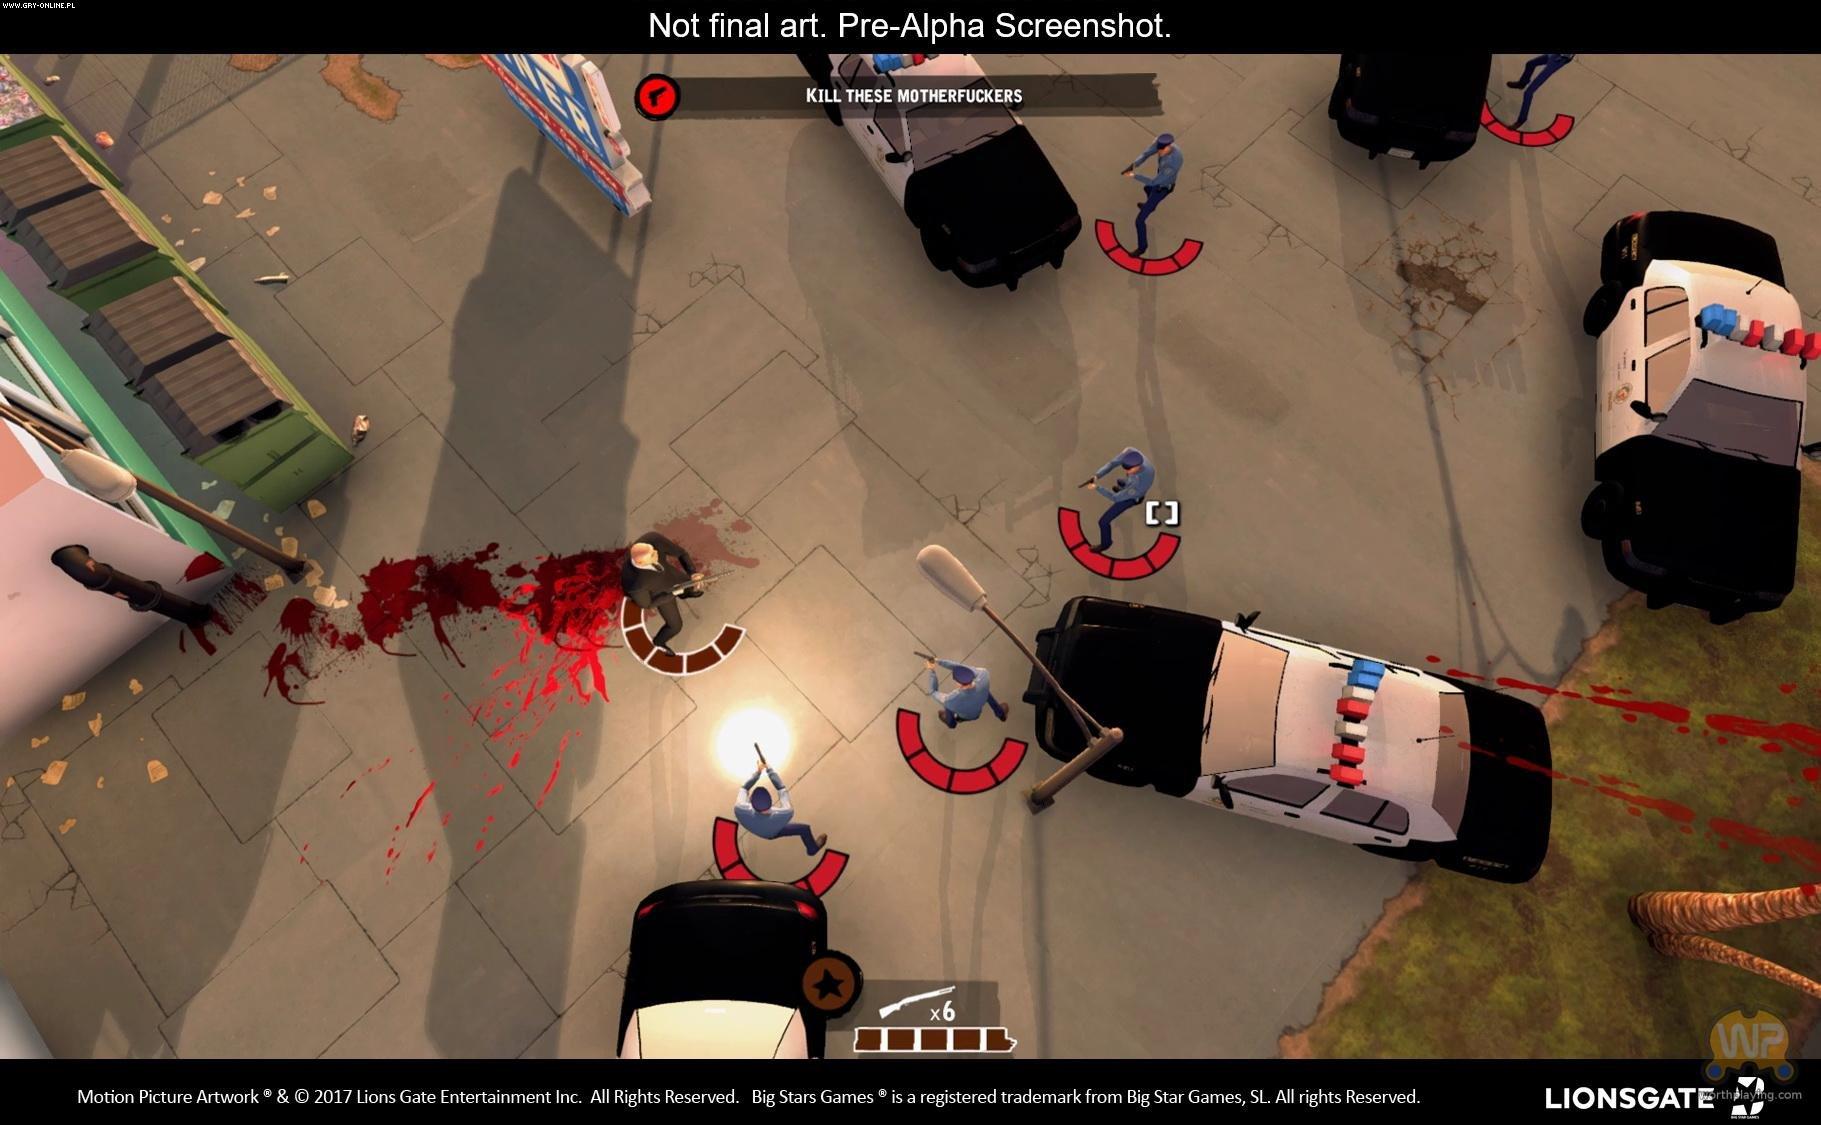 Reservoir Dogs: Bloody Days PC, XONE Games Image 5/6, Big Games, Big Star Games